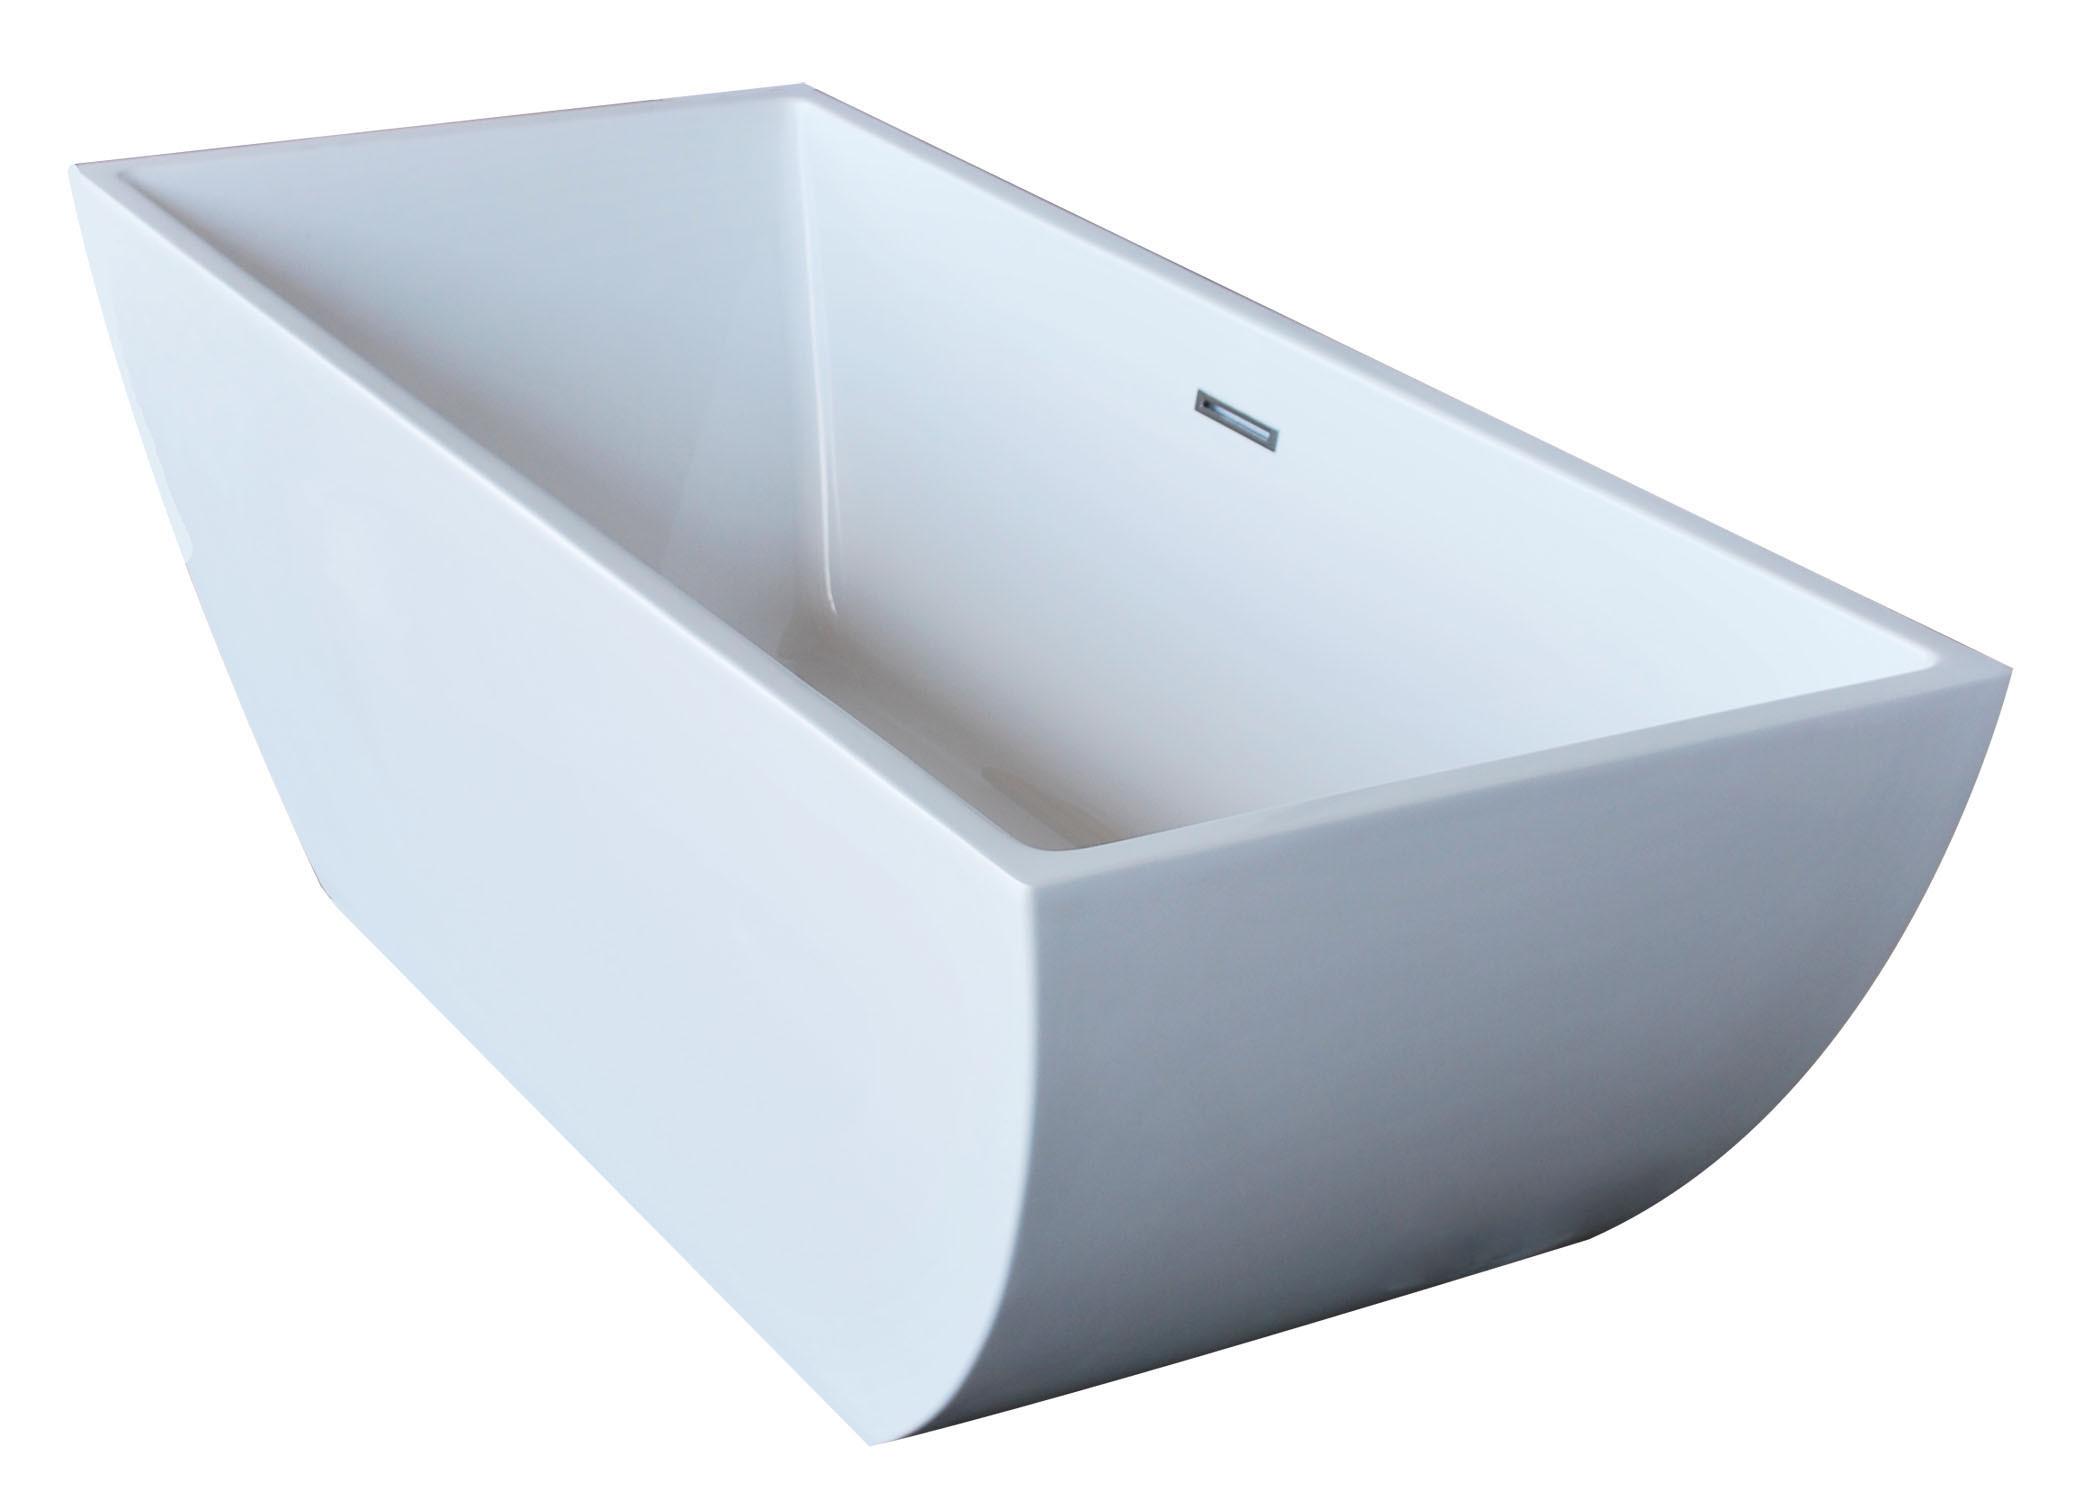 Anzzi FT-AZ007 Rook 5.6 ft. Center Drain Freestanding Bathtub Glossy White